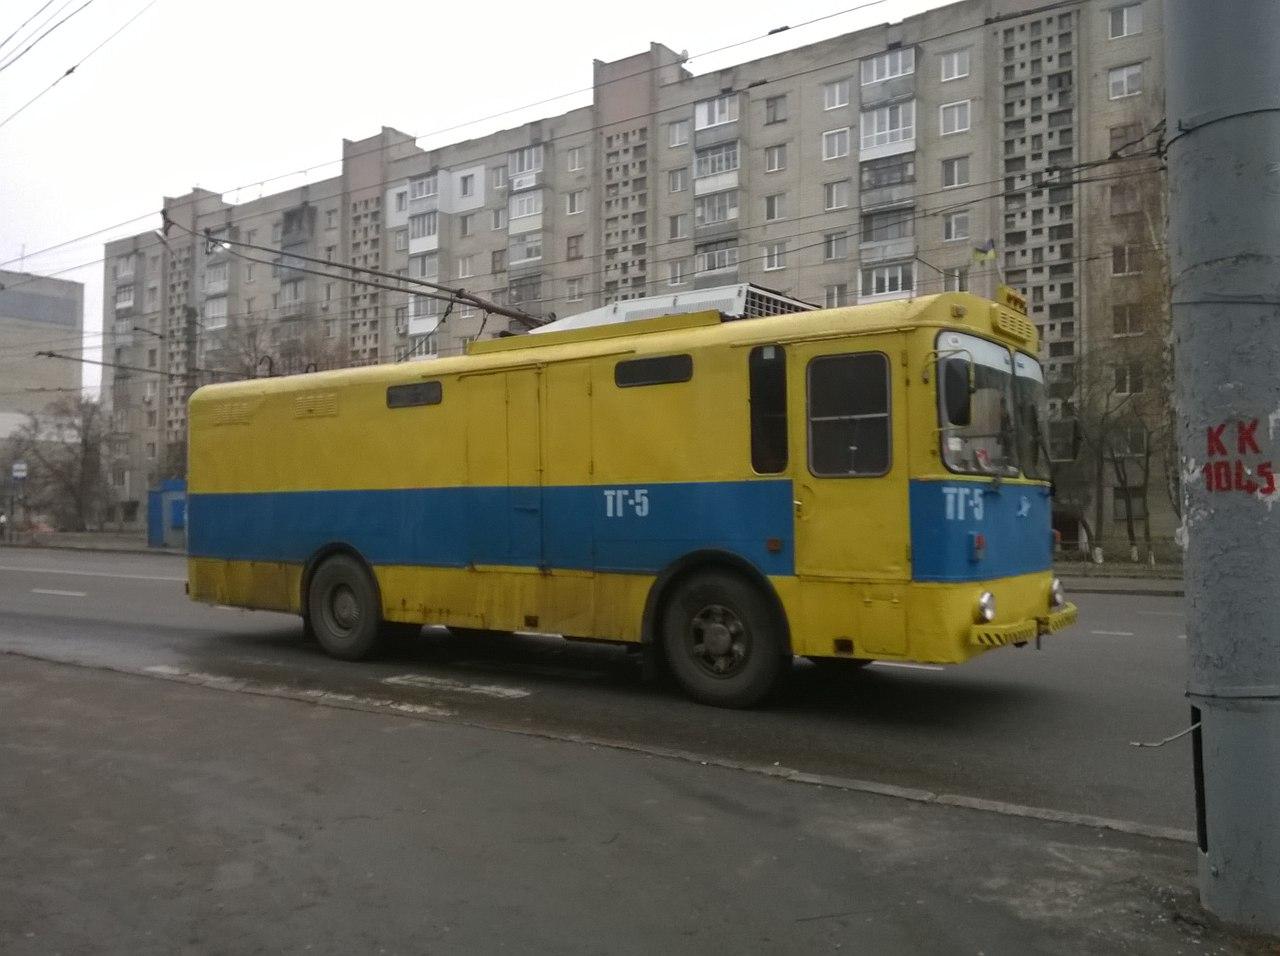 Грузовой троллейбус ТГ-5